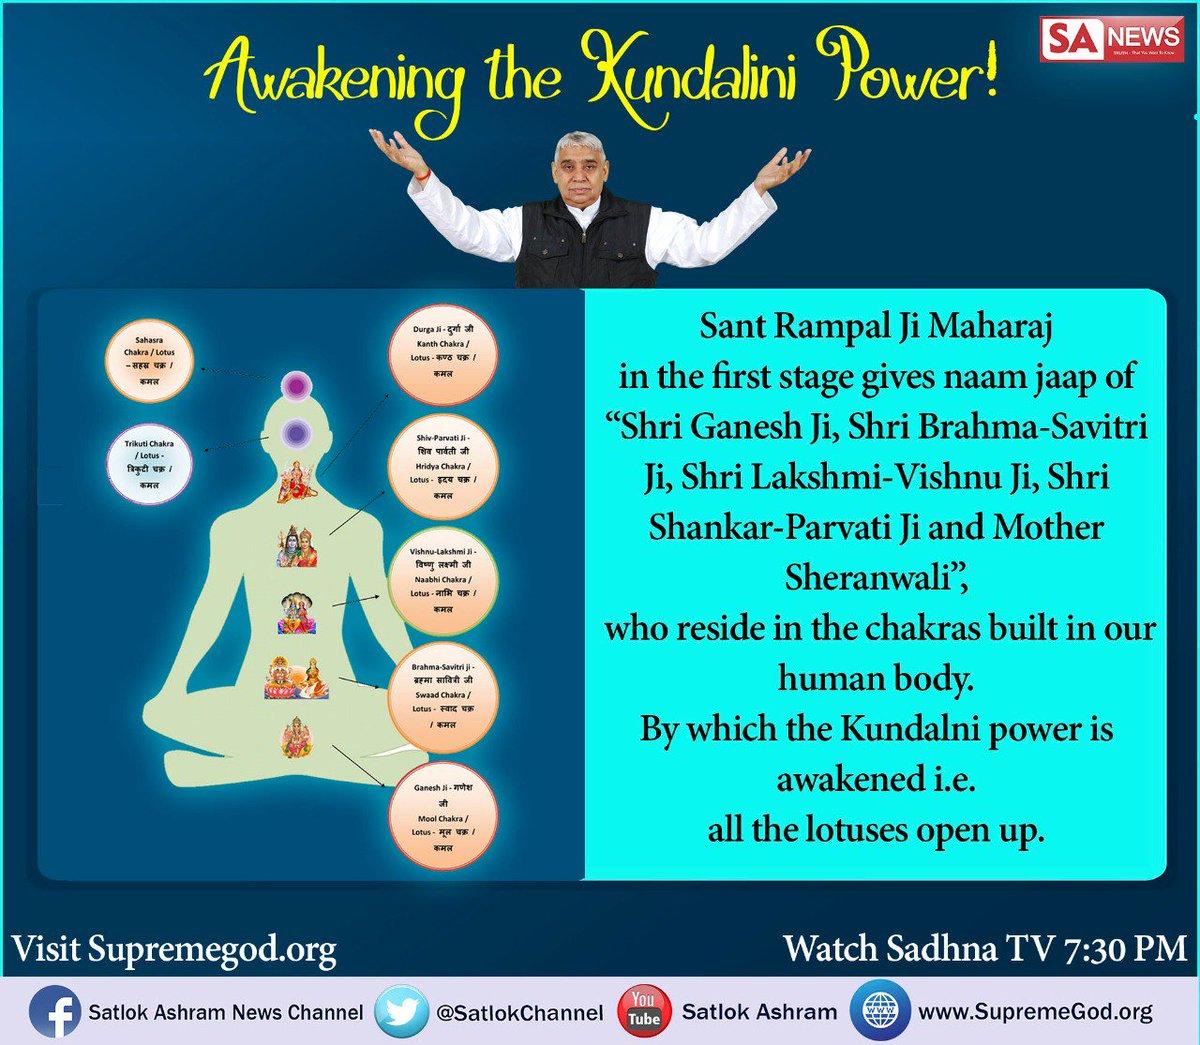 #SundayMotivation #SaintRampalJi gives naam-daan in 3 stages. In 1st stage He gives naam jaap of Ganesh Ji, Brahma-Savitri Ji,Lakshmi-Vishnu Ji, Shankar-Parvati Ji &amp; Sheranwali, who reside in the chakras built in our human body. Through which the Kundalni power is awakened.<br>http://pic.twitter.com/lWArjQXALx